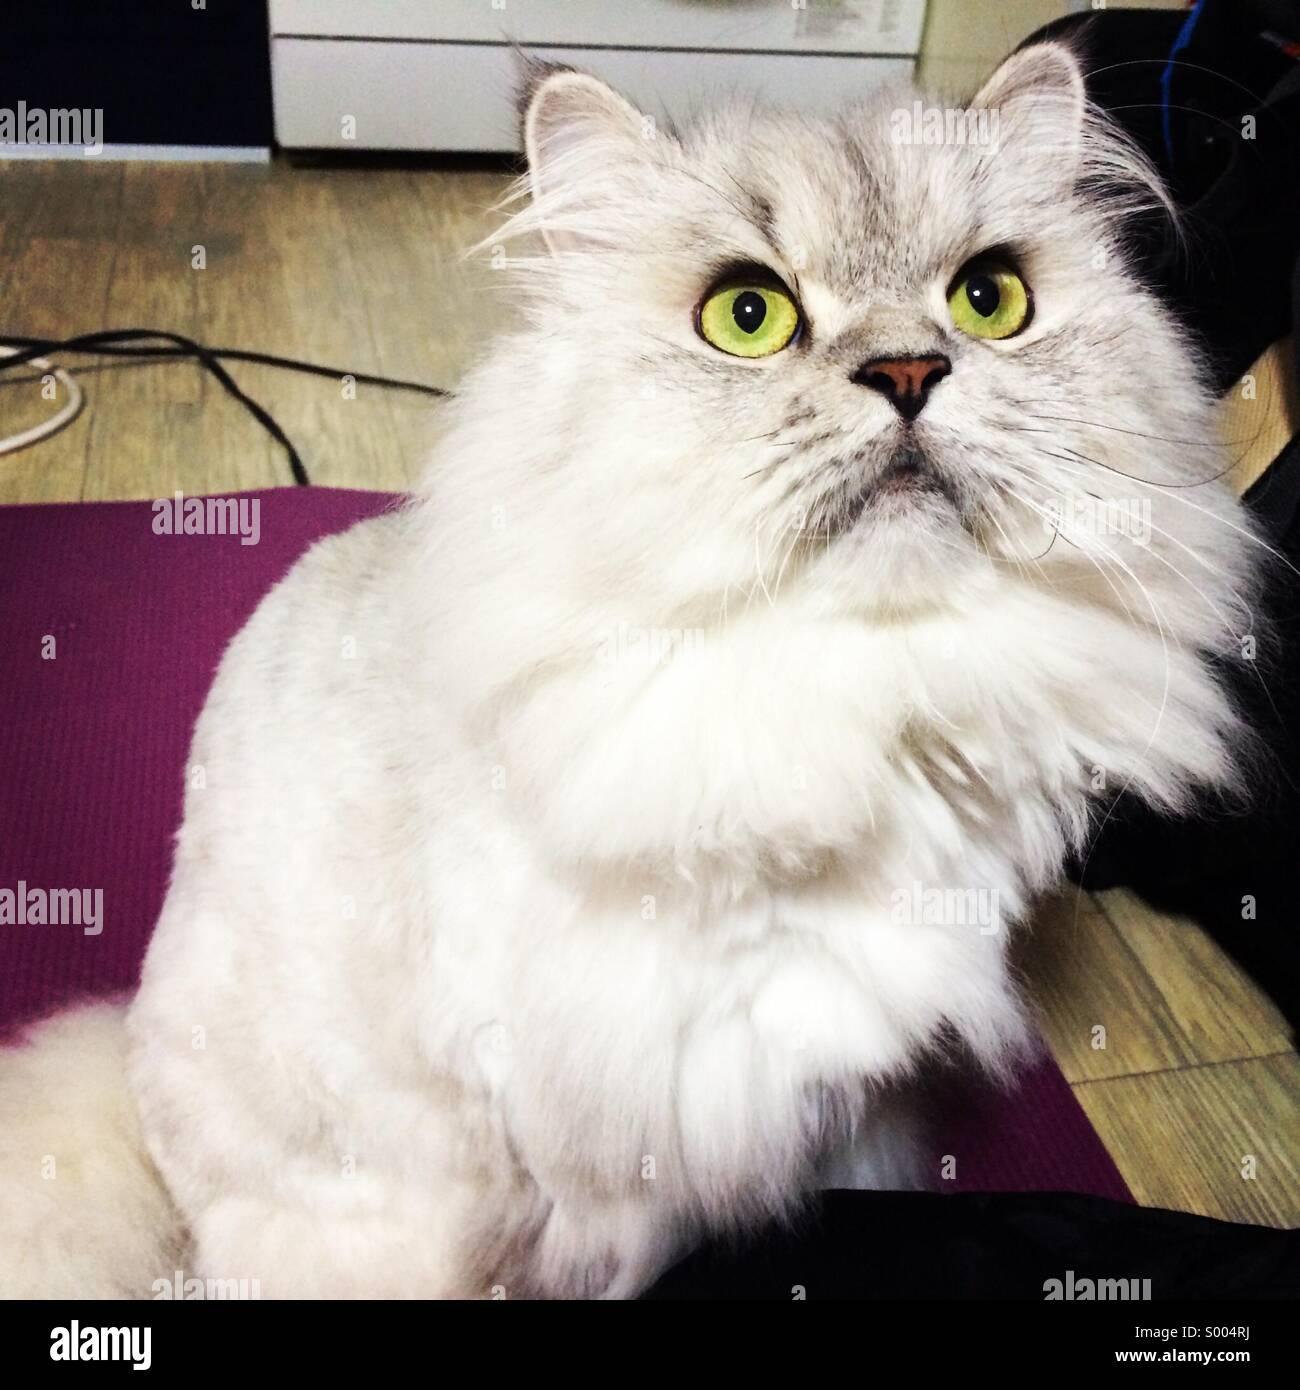 Vimba the cat - Stock Image